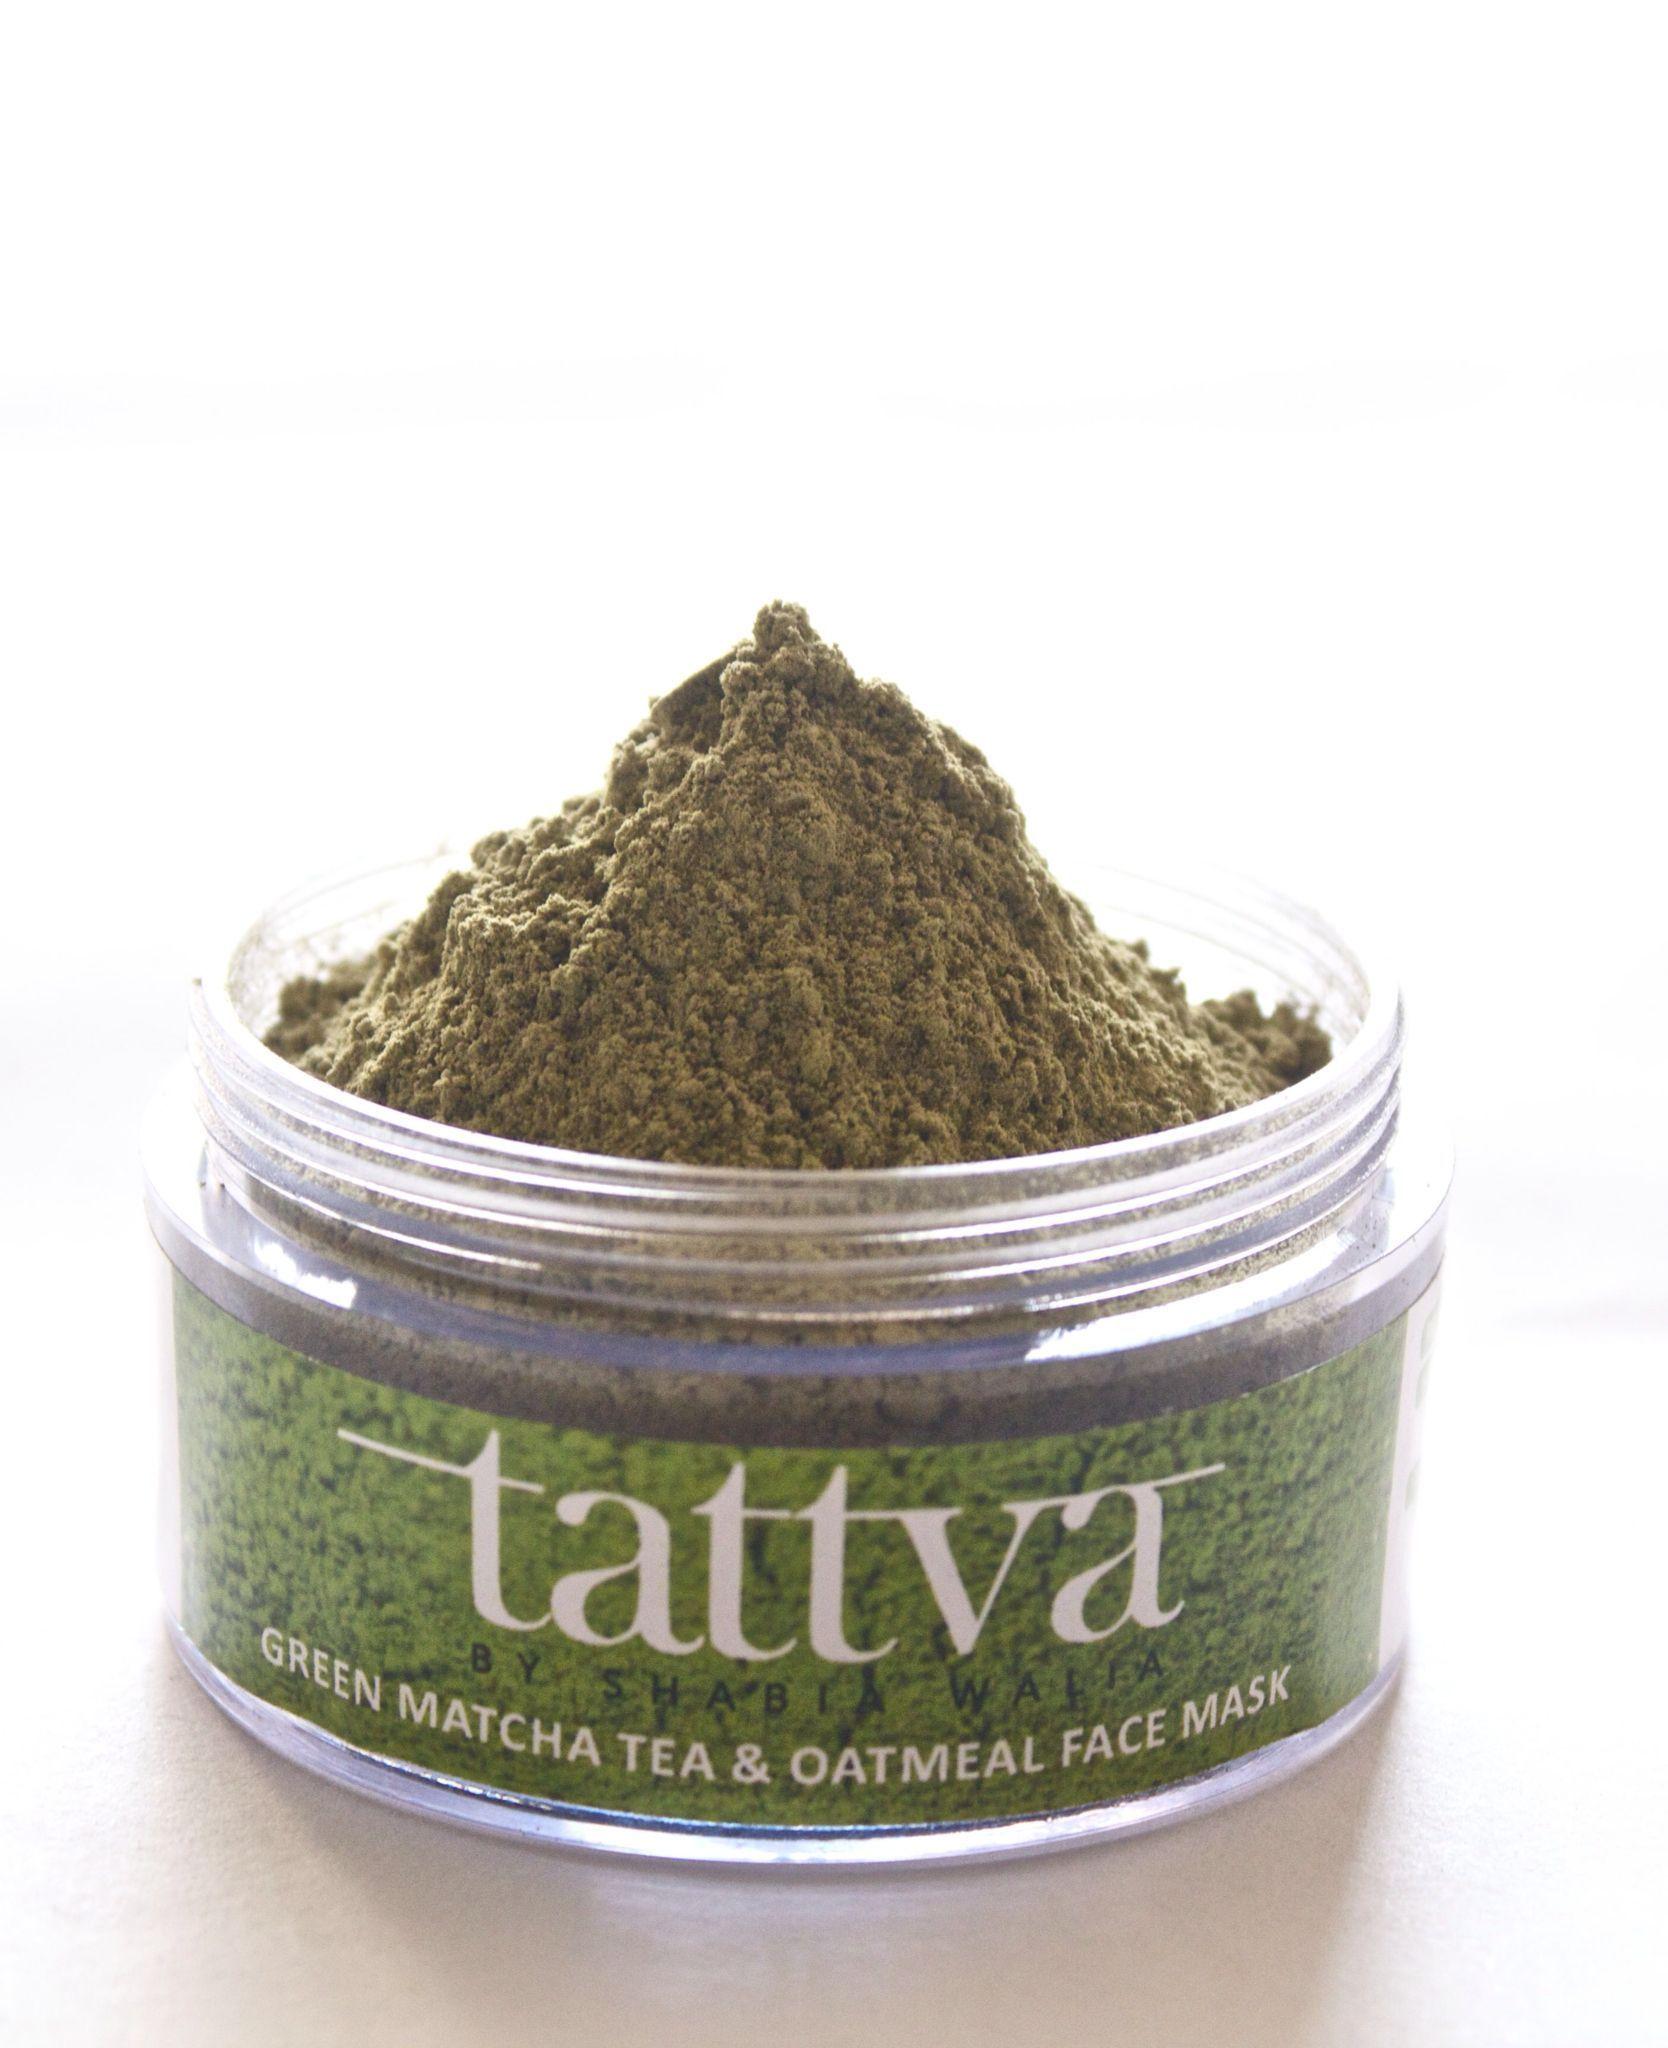 Tattva Green Matcha Tea & Oatmeal Face Mask